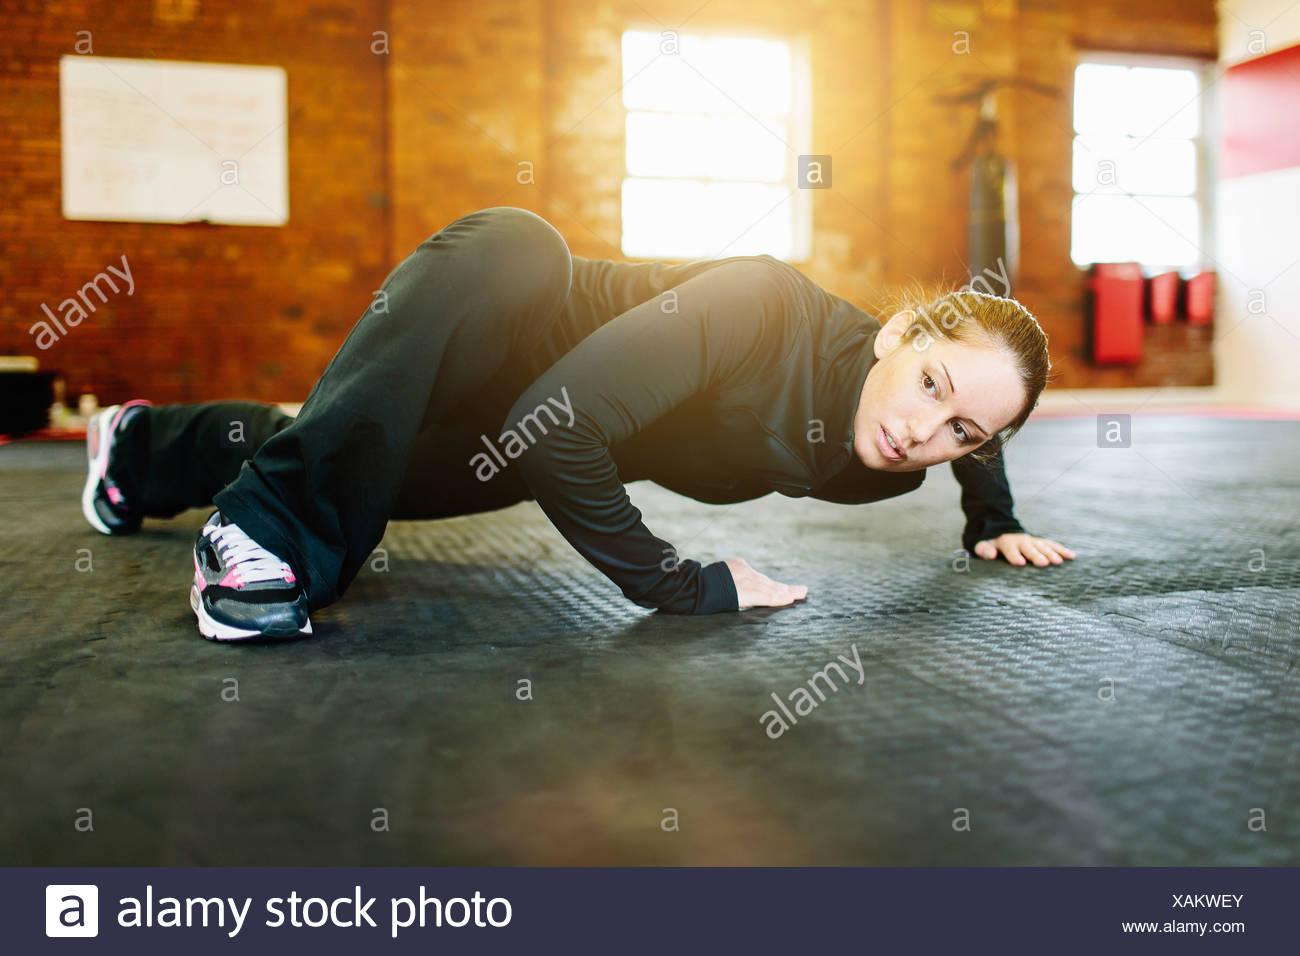 Frau, die stretching-Übung im Fitnessstudio zu tun Stockbild